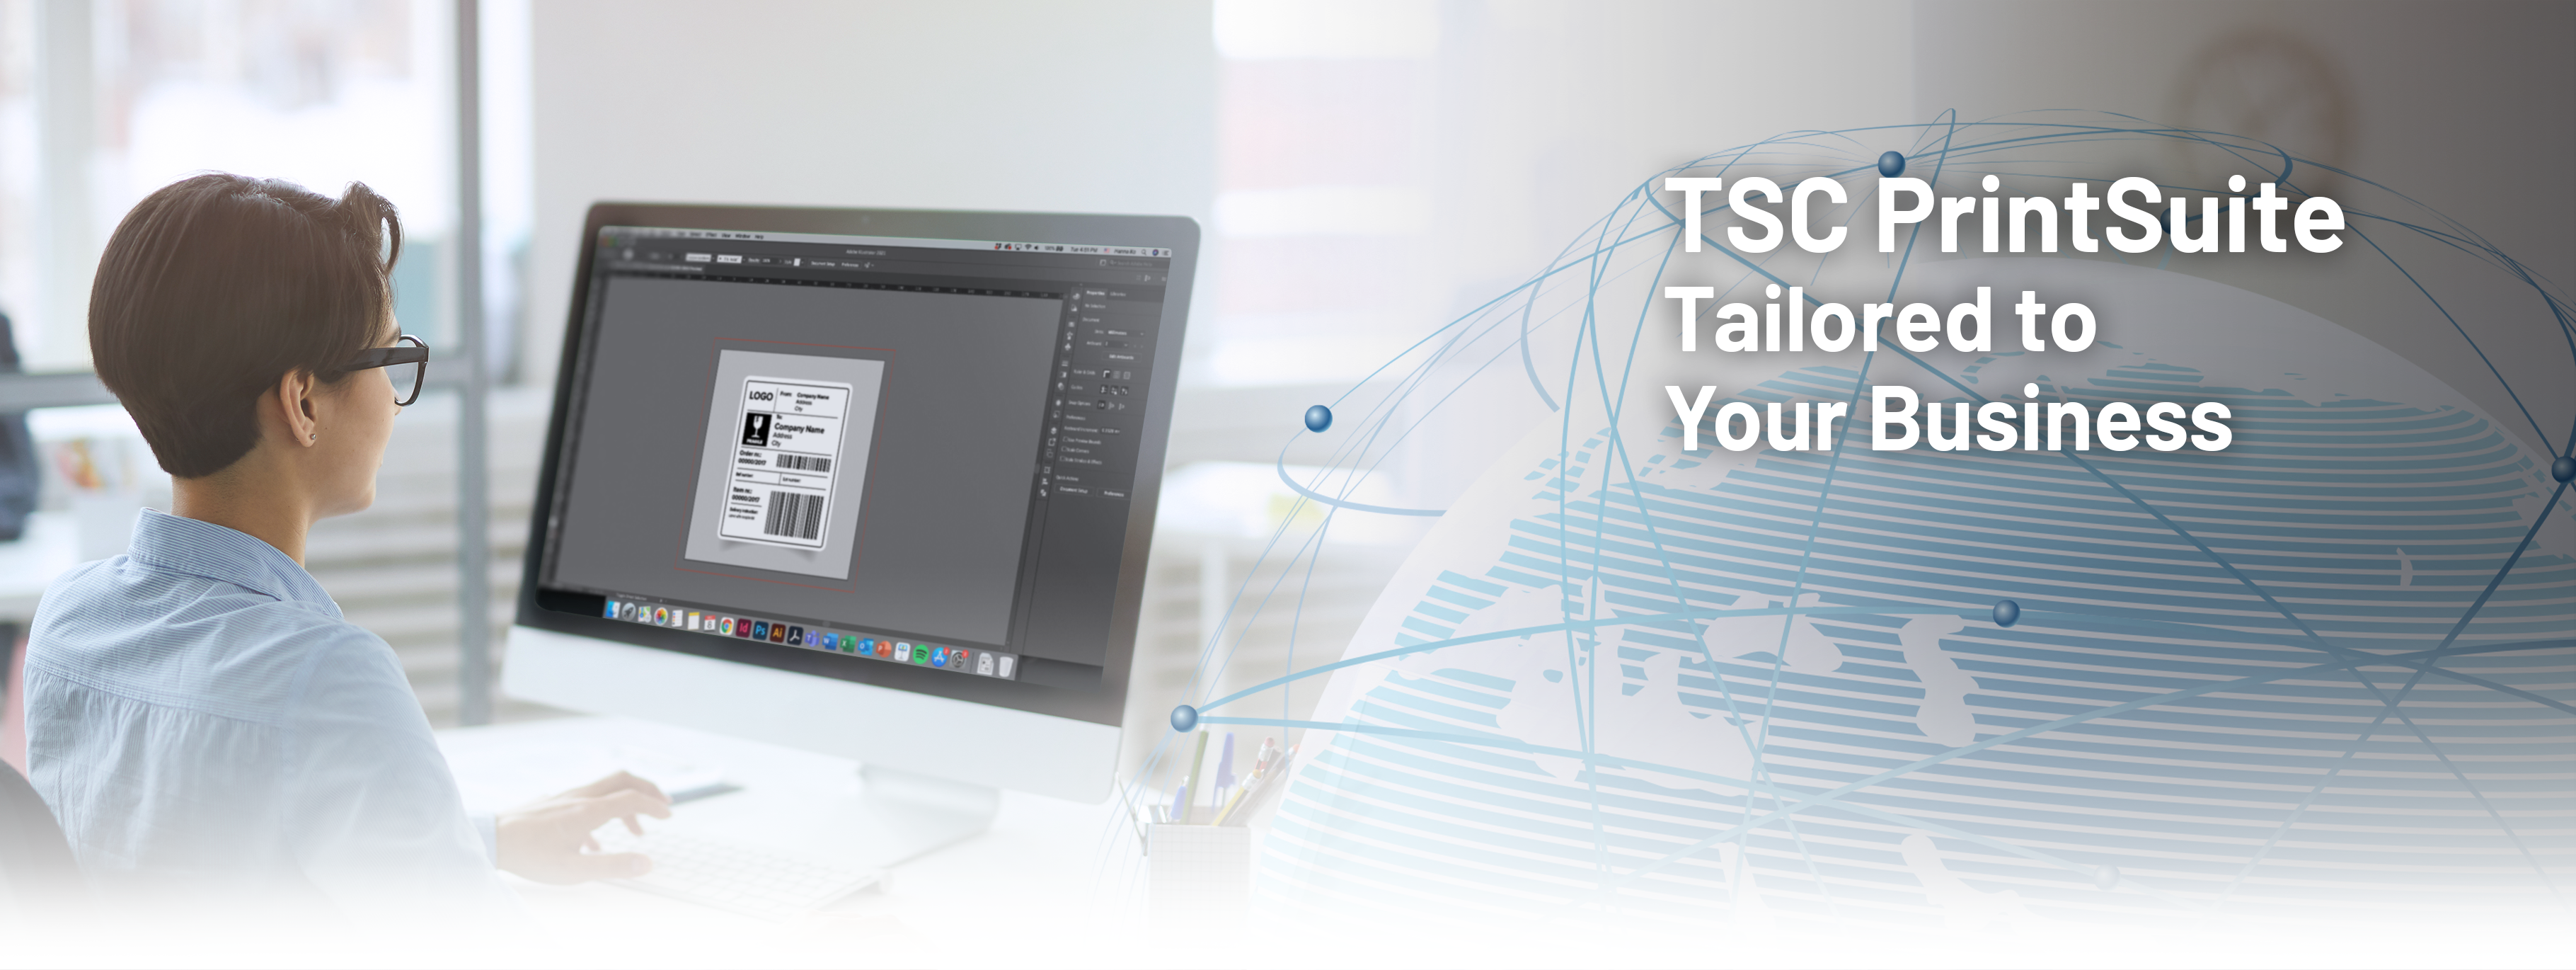 TSC-PrintSuite-Banner-Header_v3